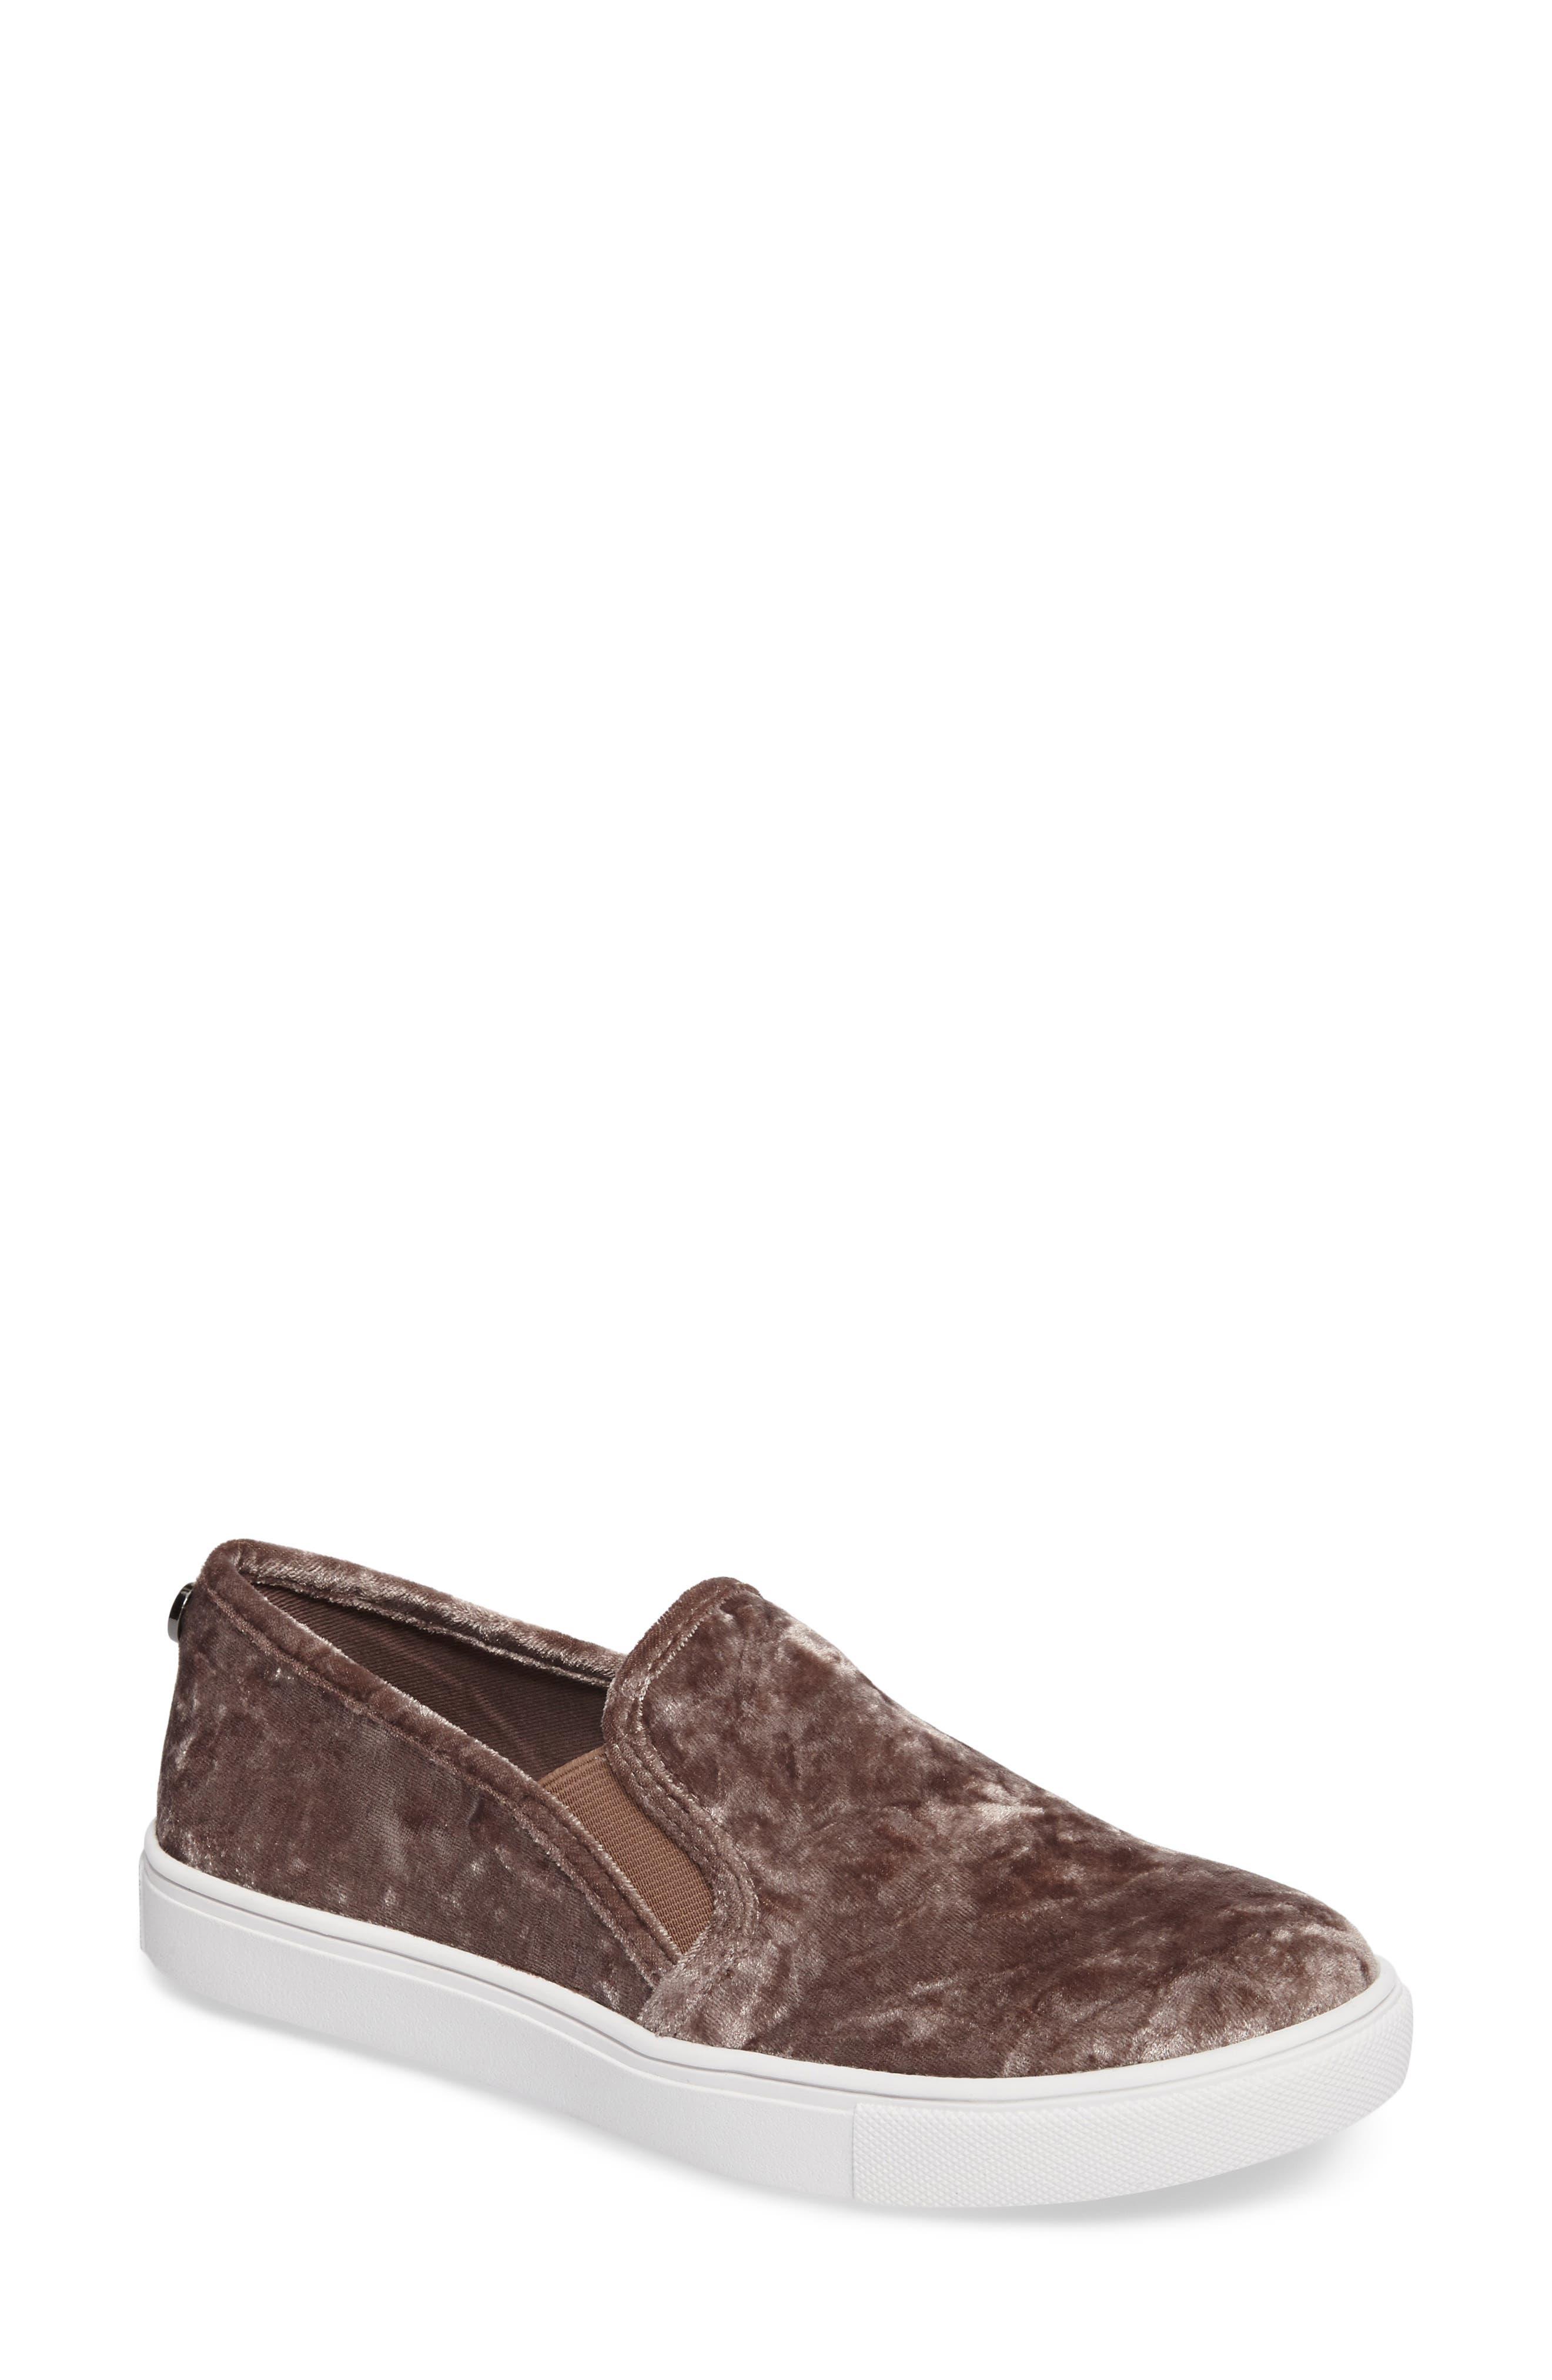 Ecntrcv Slip-On Sneaker,                             Main thumbnail 1, color,                             Mushroom Fabric